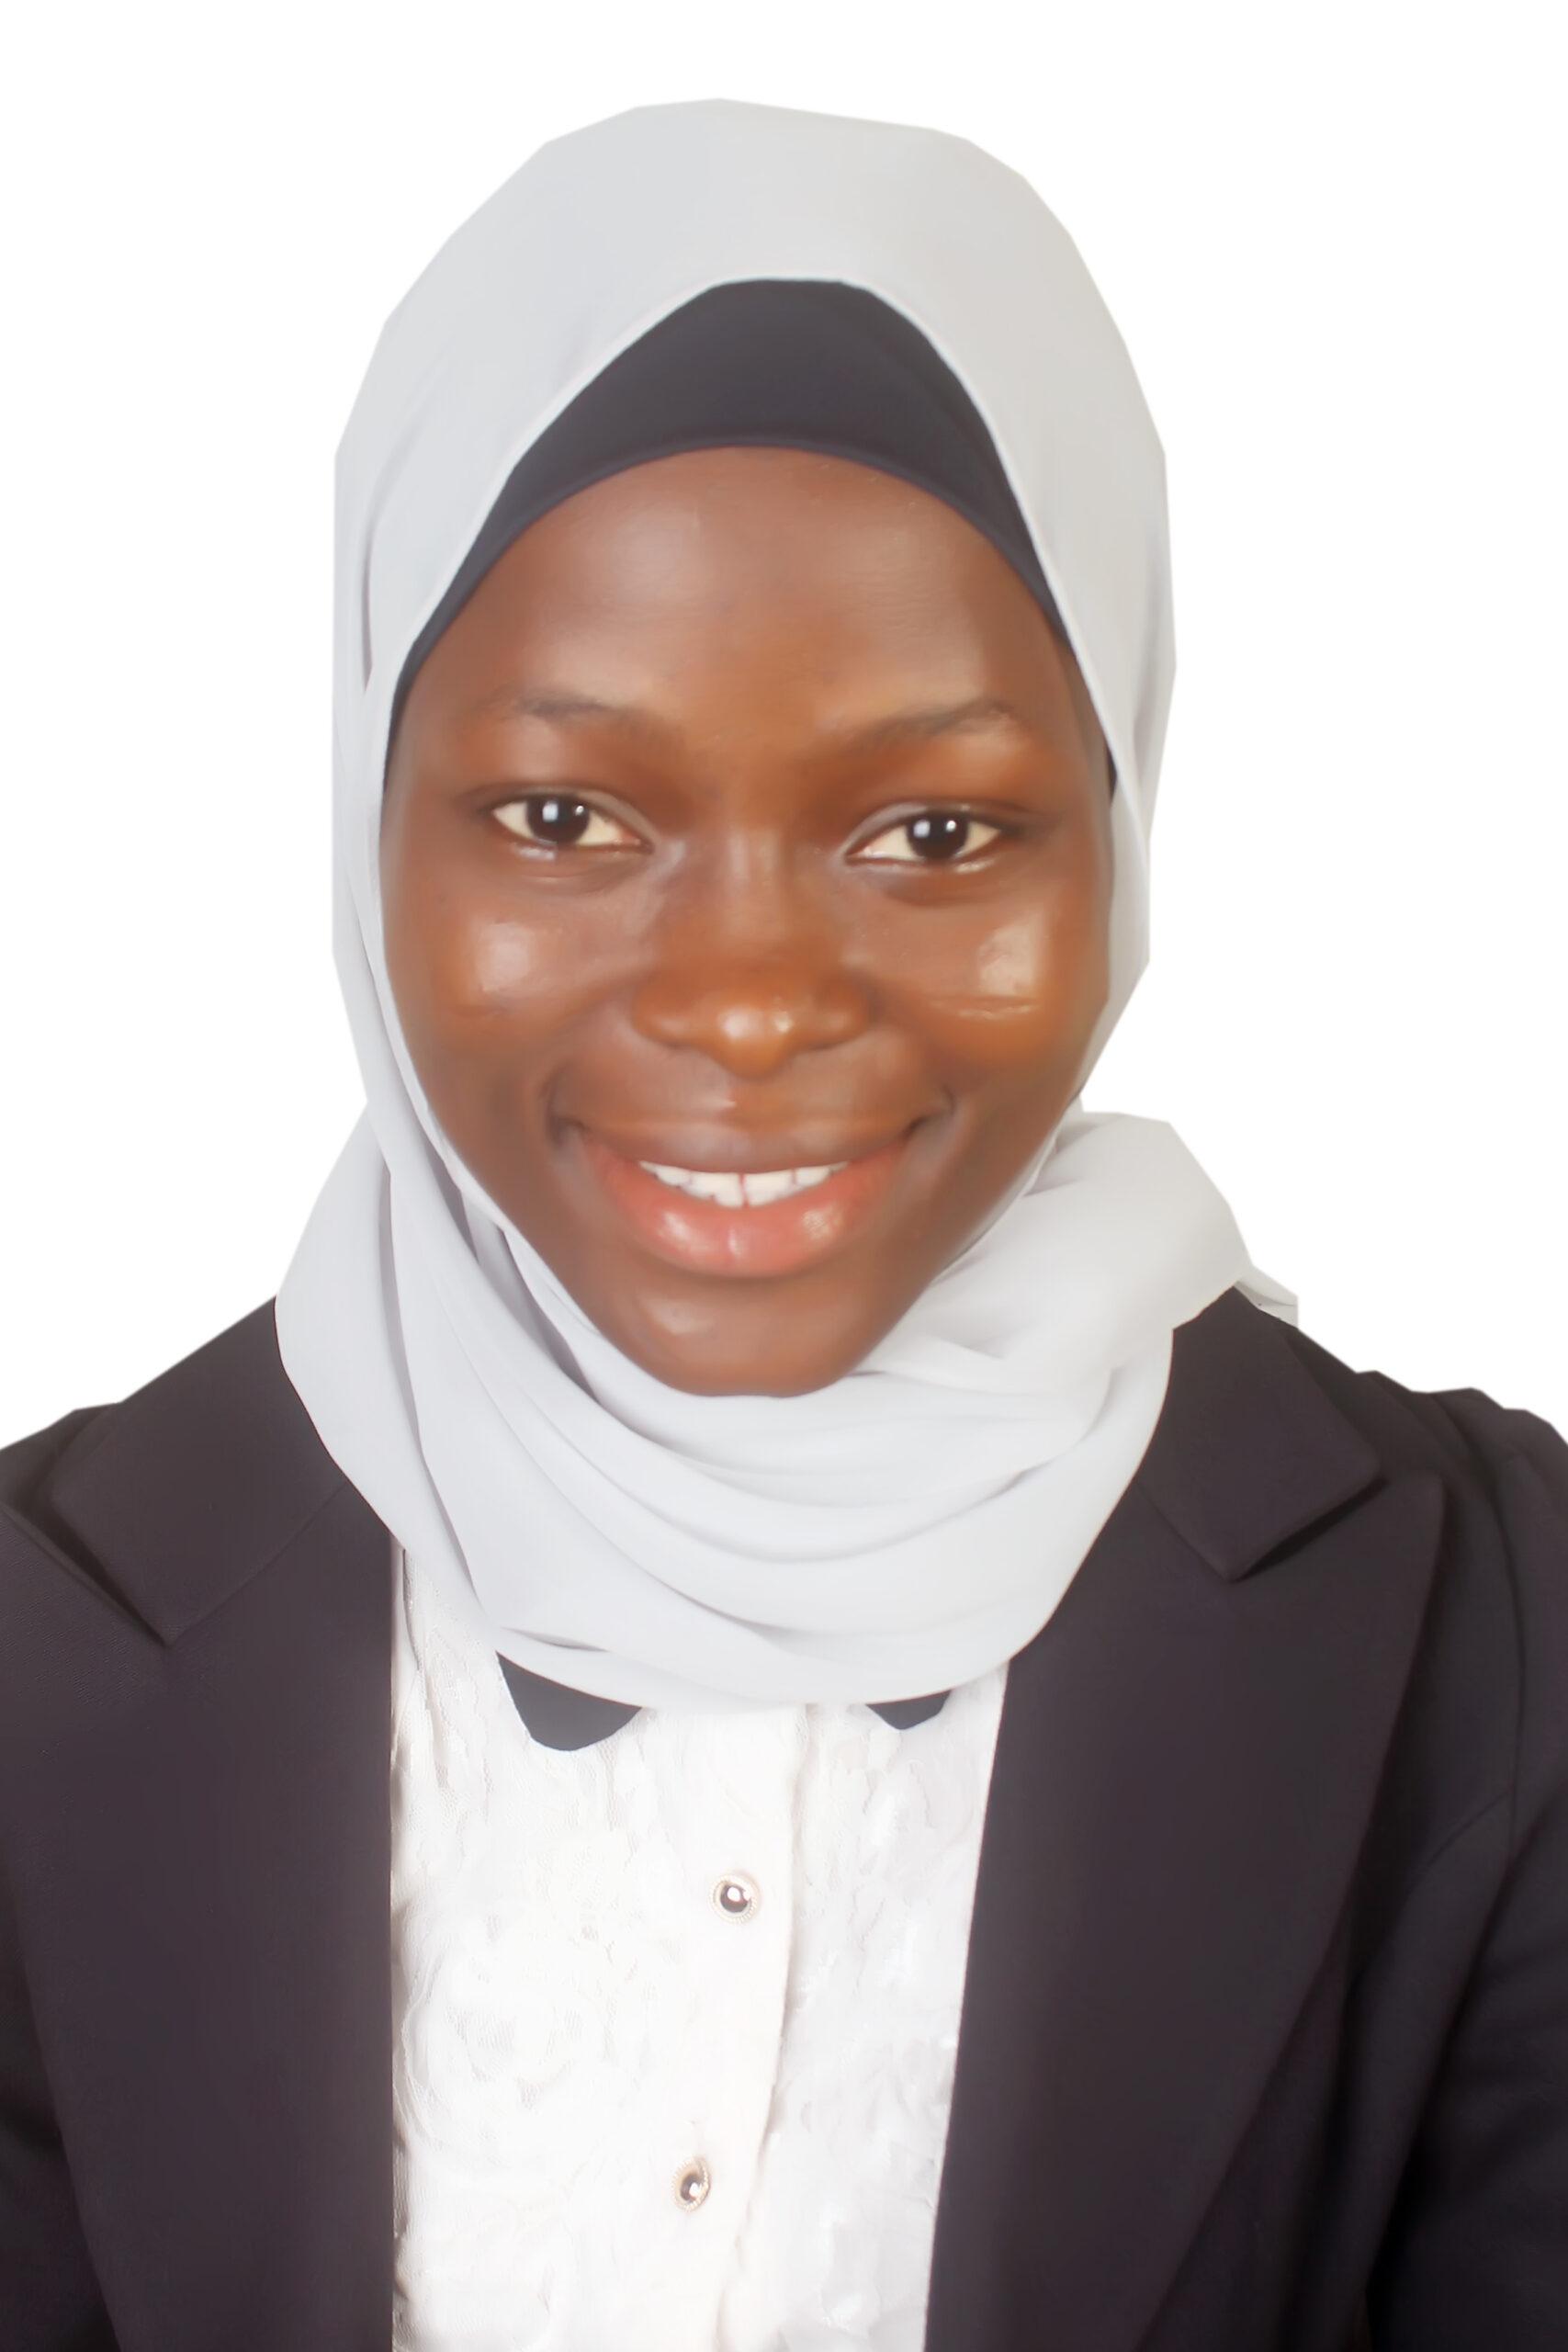 Kogi State Law Students Association Ahmadu Bello University Zaria, Latifat Asipita Jinadu, Kogi State, Nigeria